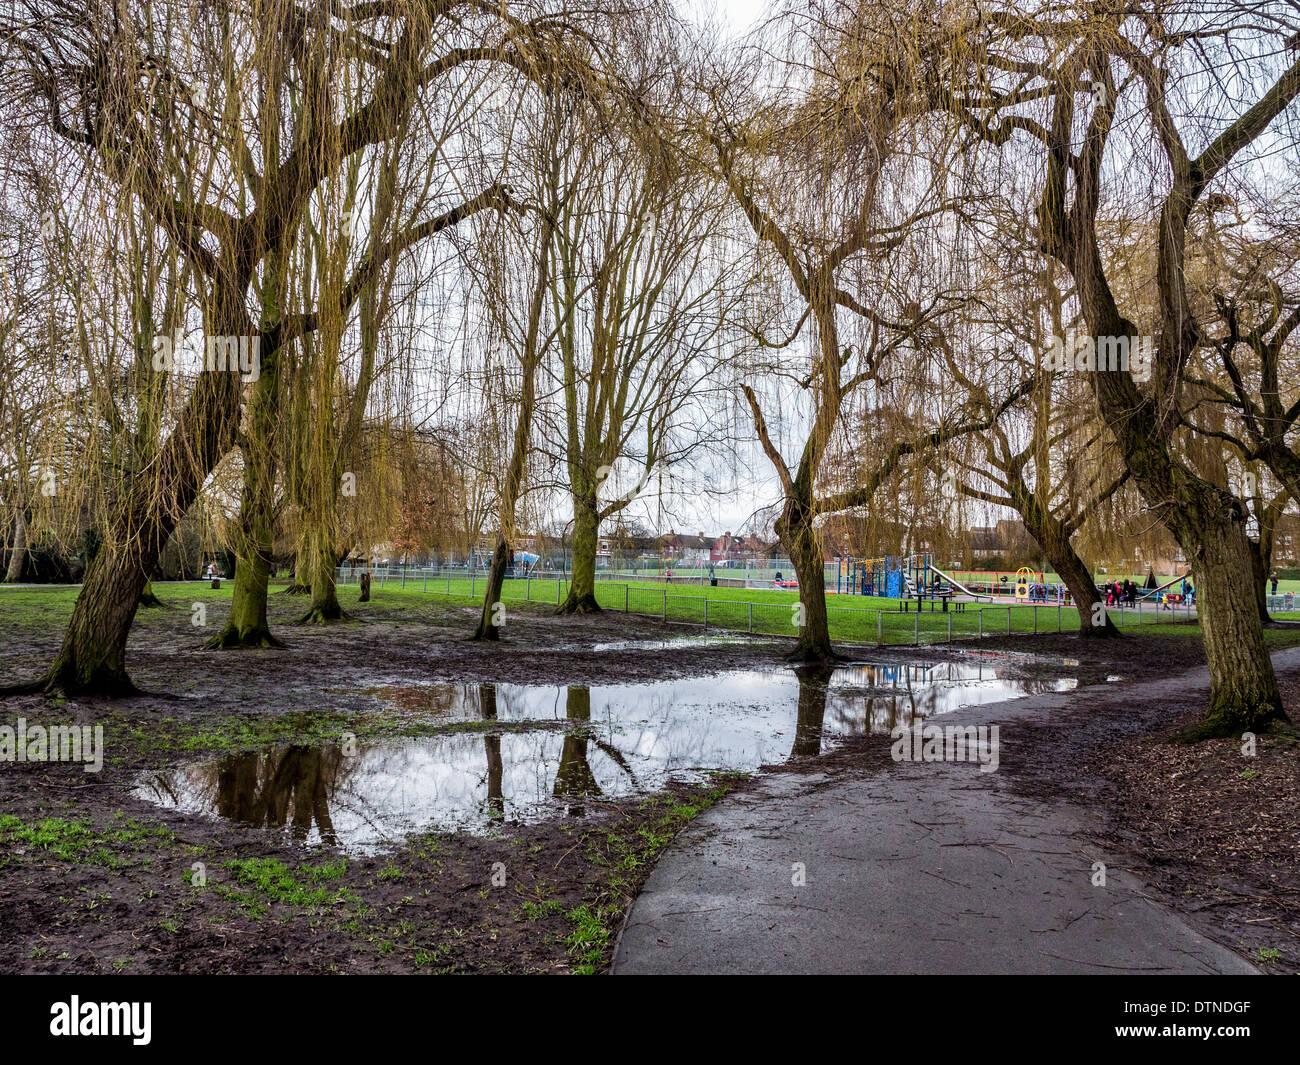 Crane Park - muddy puddles and standing water after heavy winter rainfall near Children's playground - Twickenham, UK - Stock Image